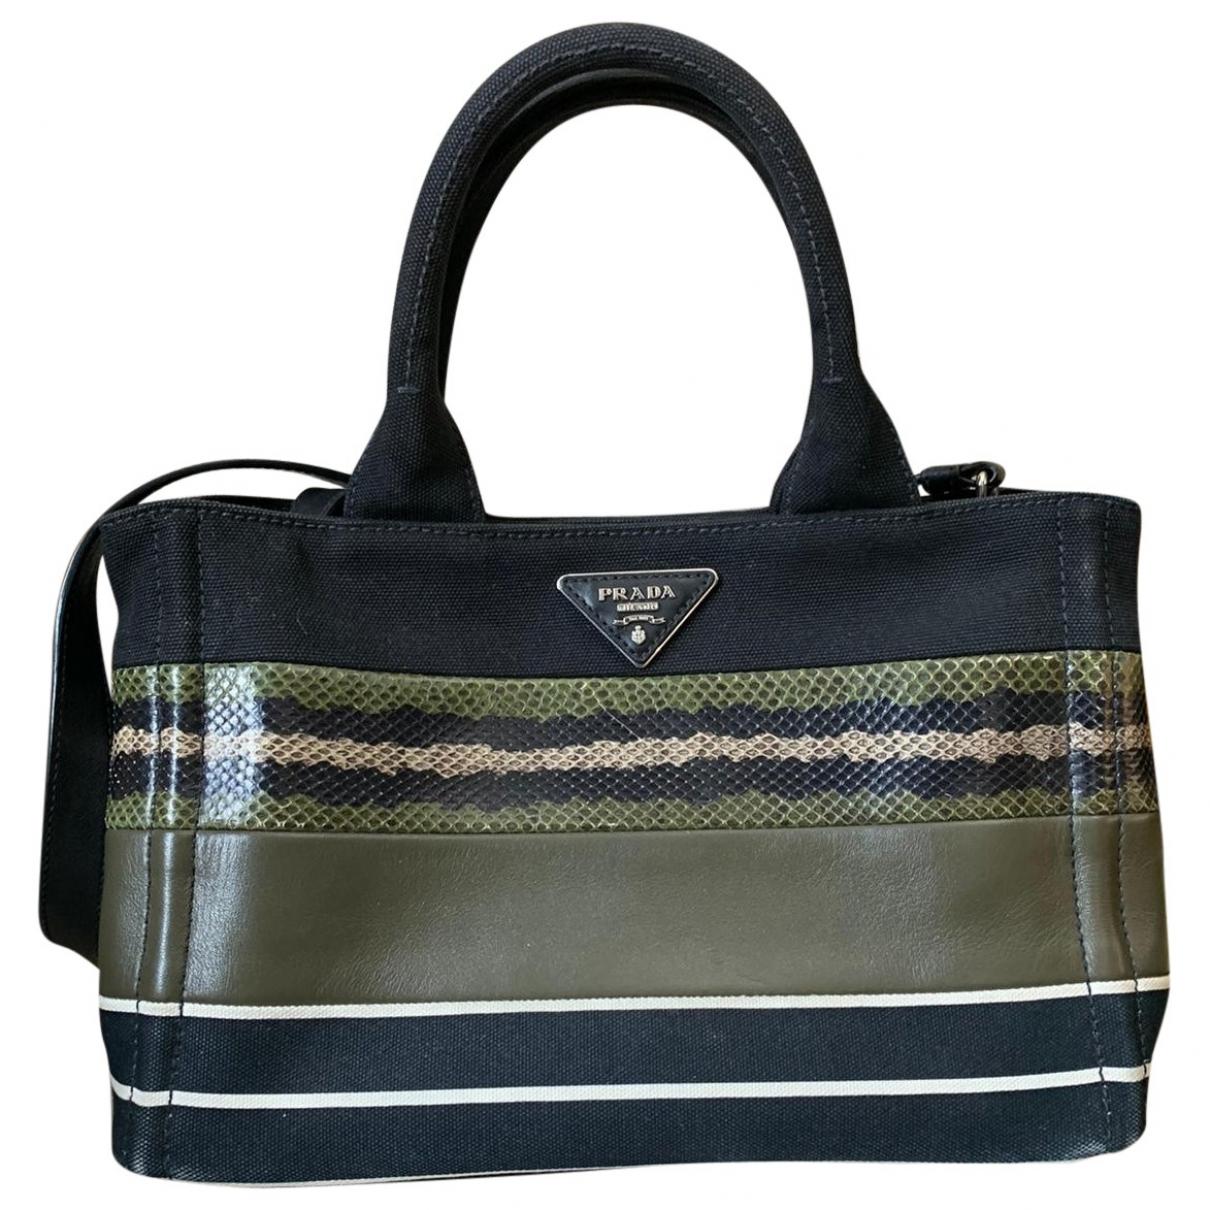 Prada \N Multicolour Cloth handbag for Women \N